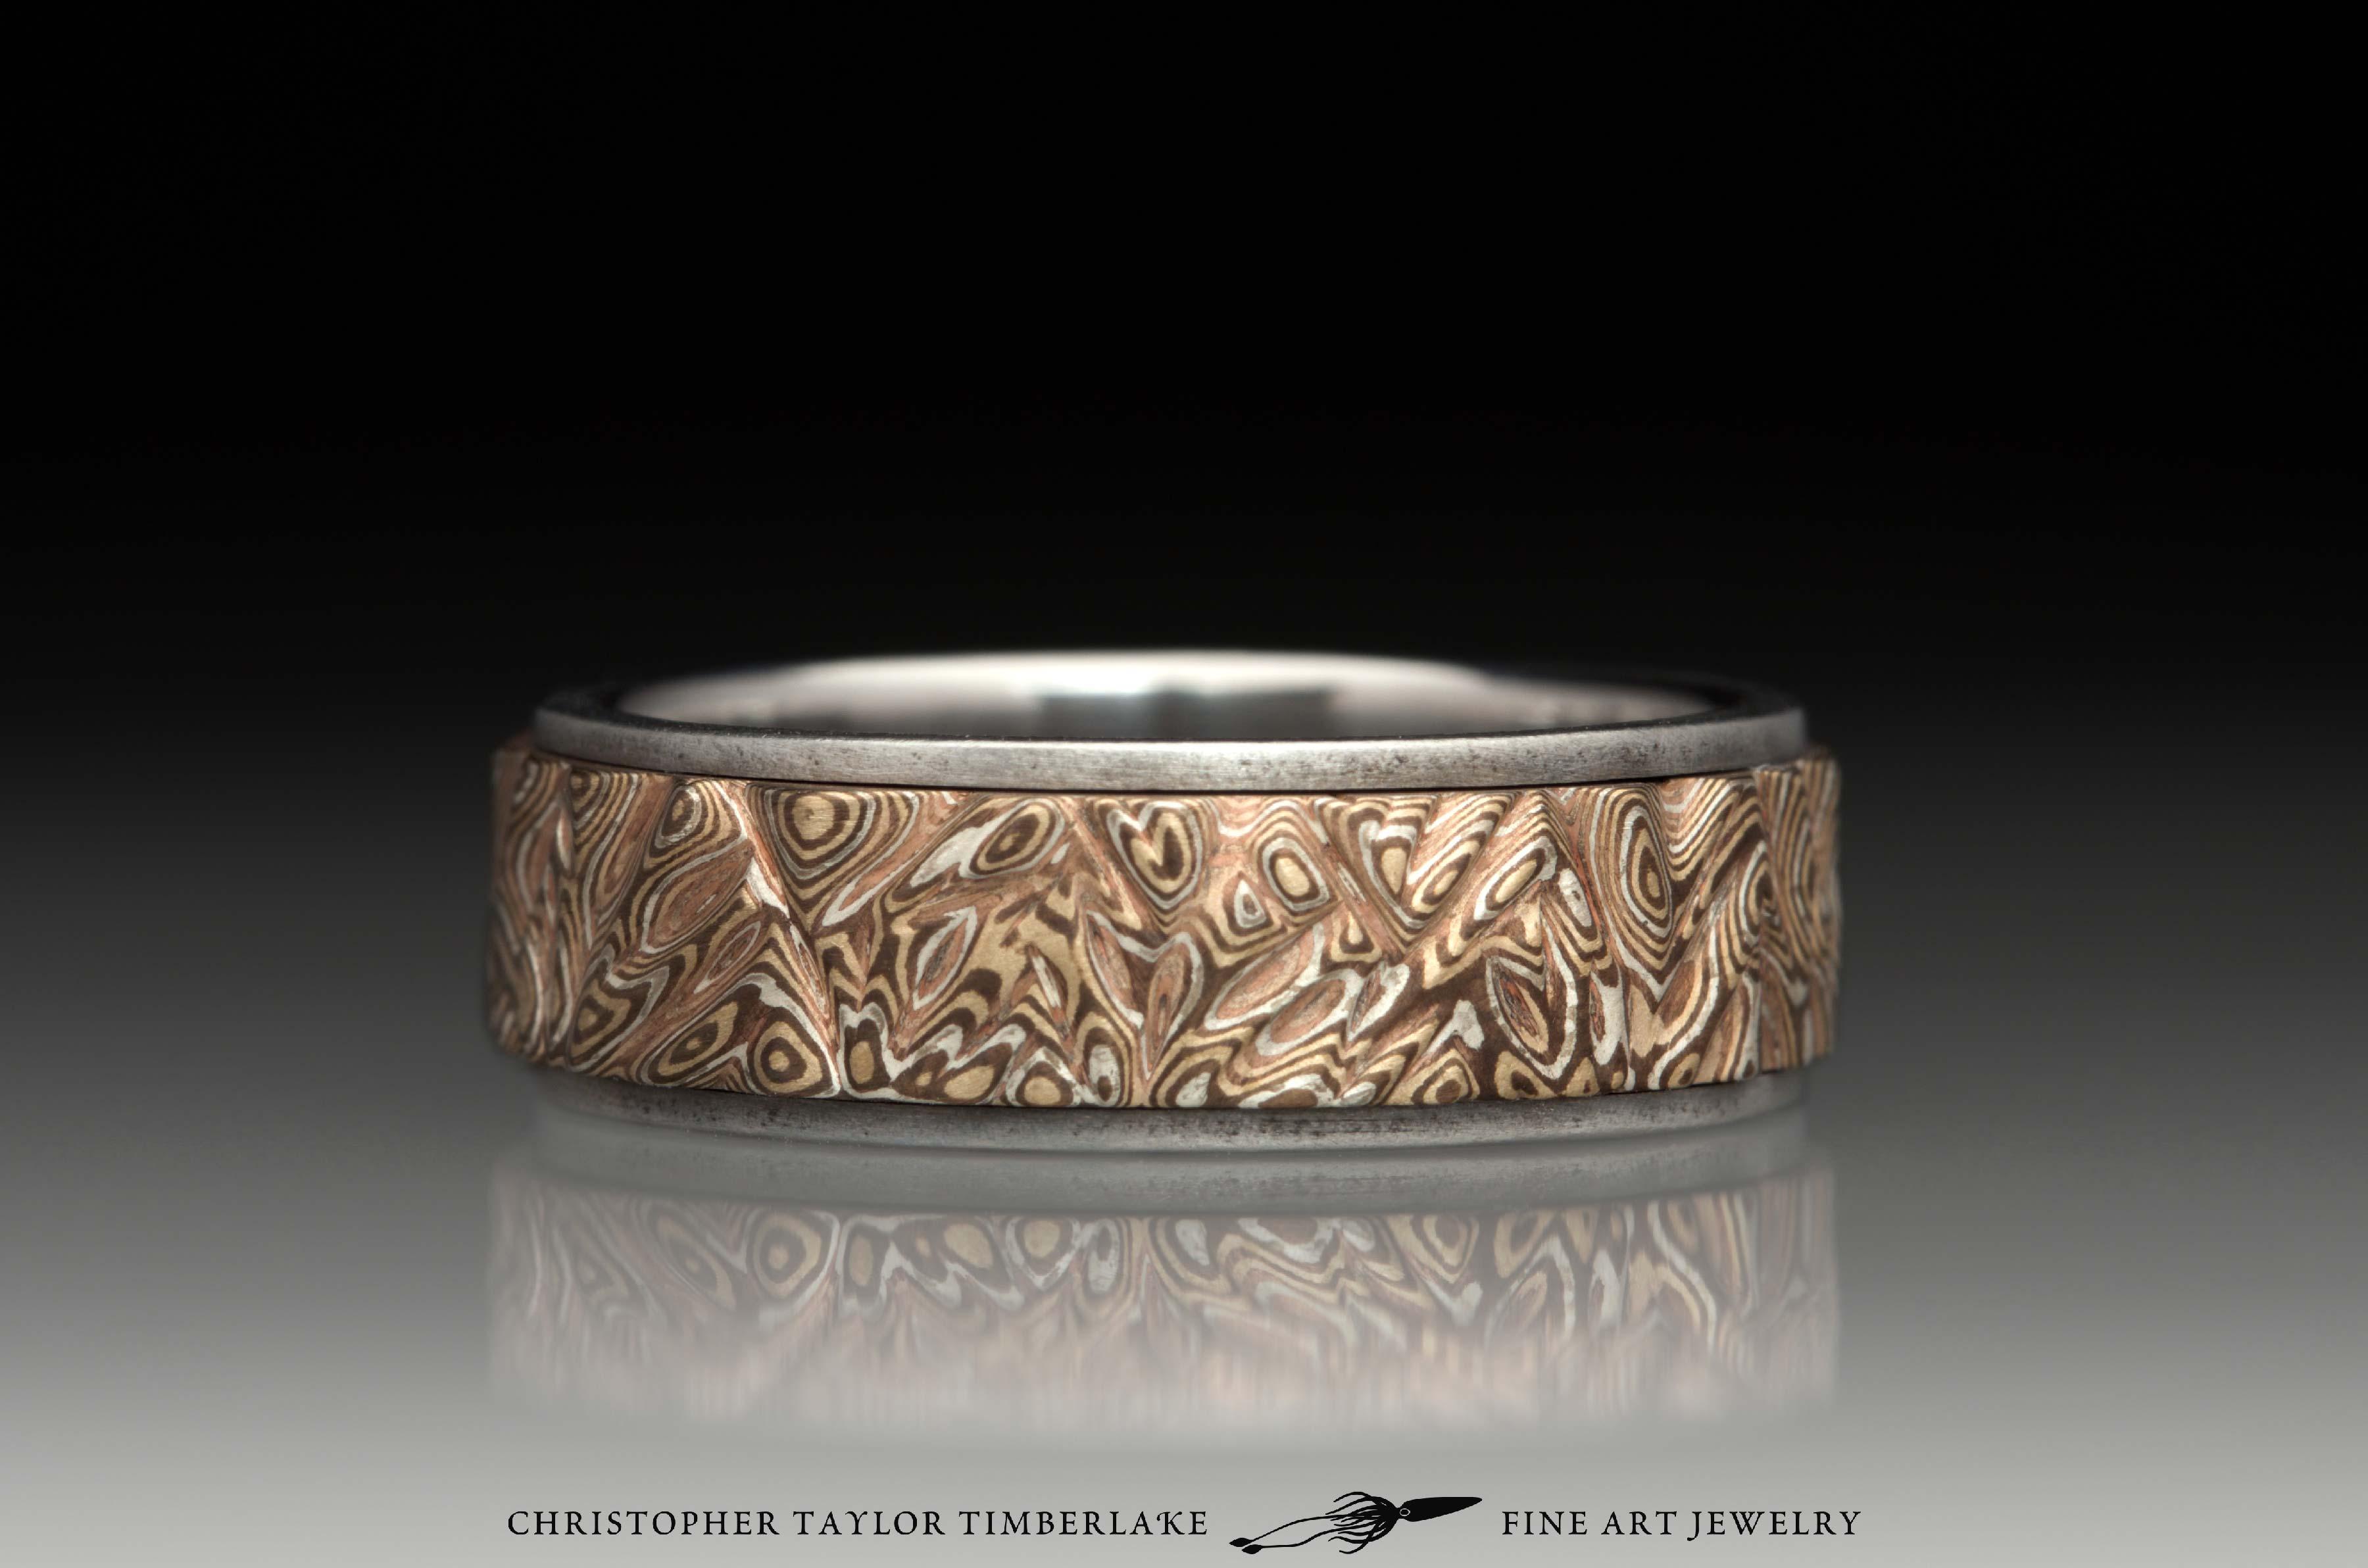 Mokumé-Mokume-Gane-Ring-M90-sterling-silver,-shakudo,-kogane,-stainless-steel-band,-oxidized,-flat-topped,-(1-5-1)-7mm-2